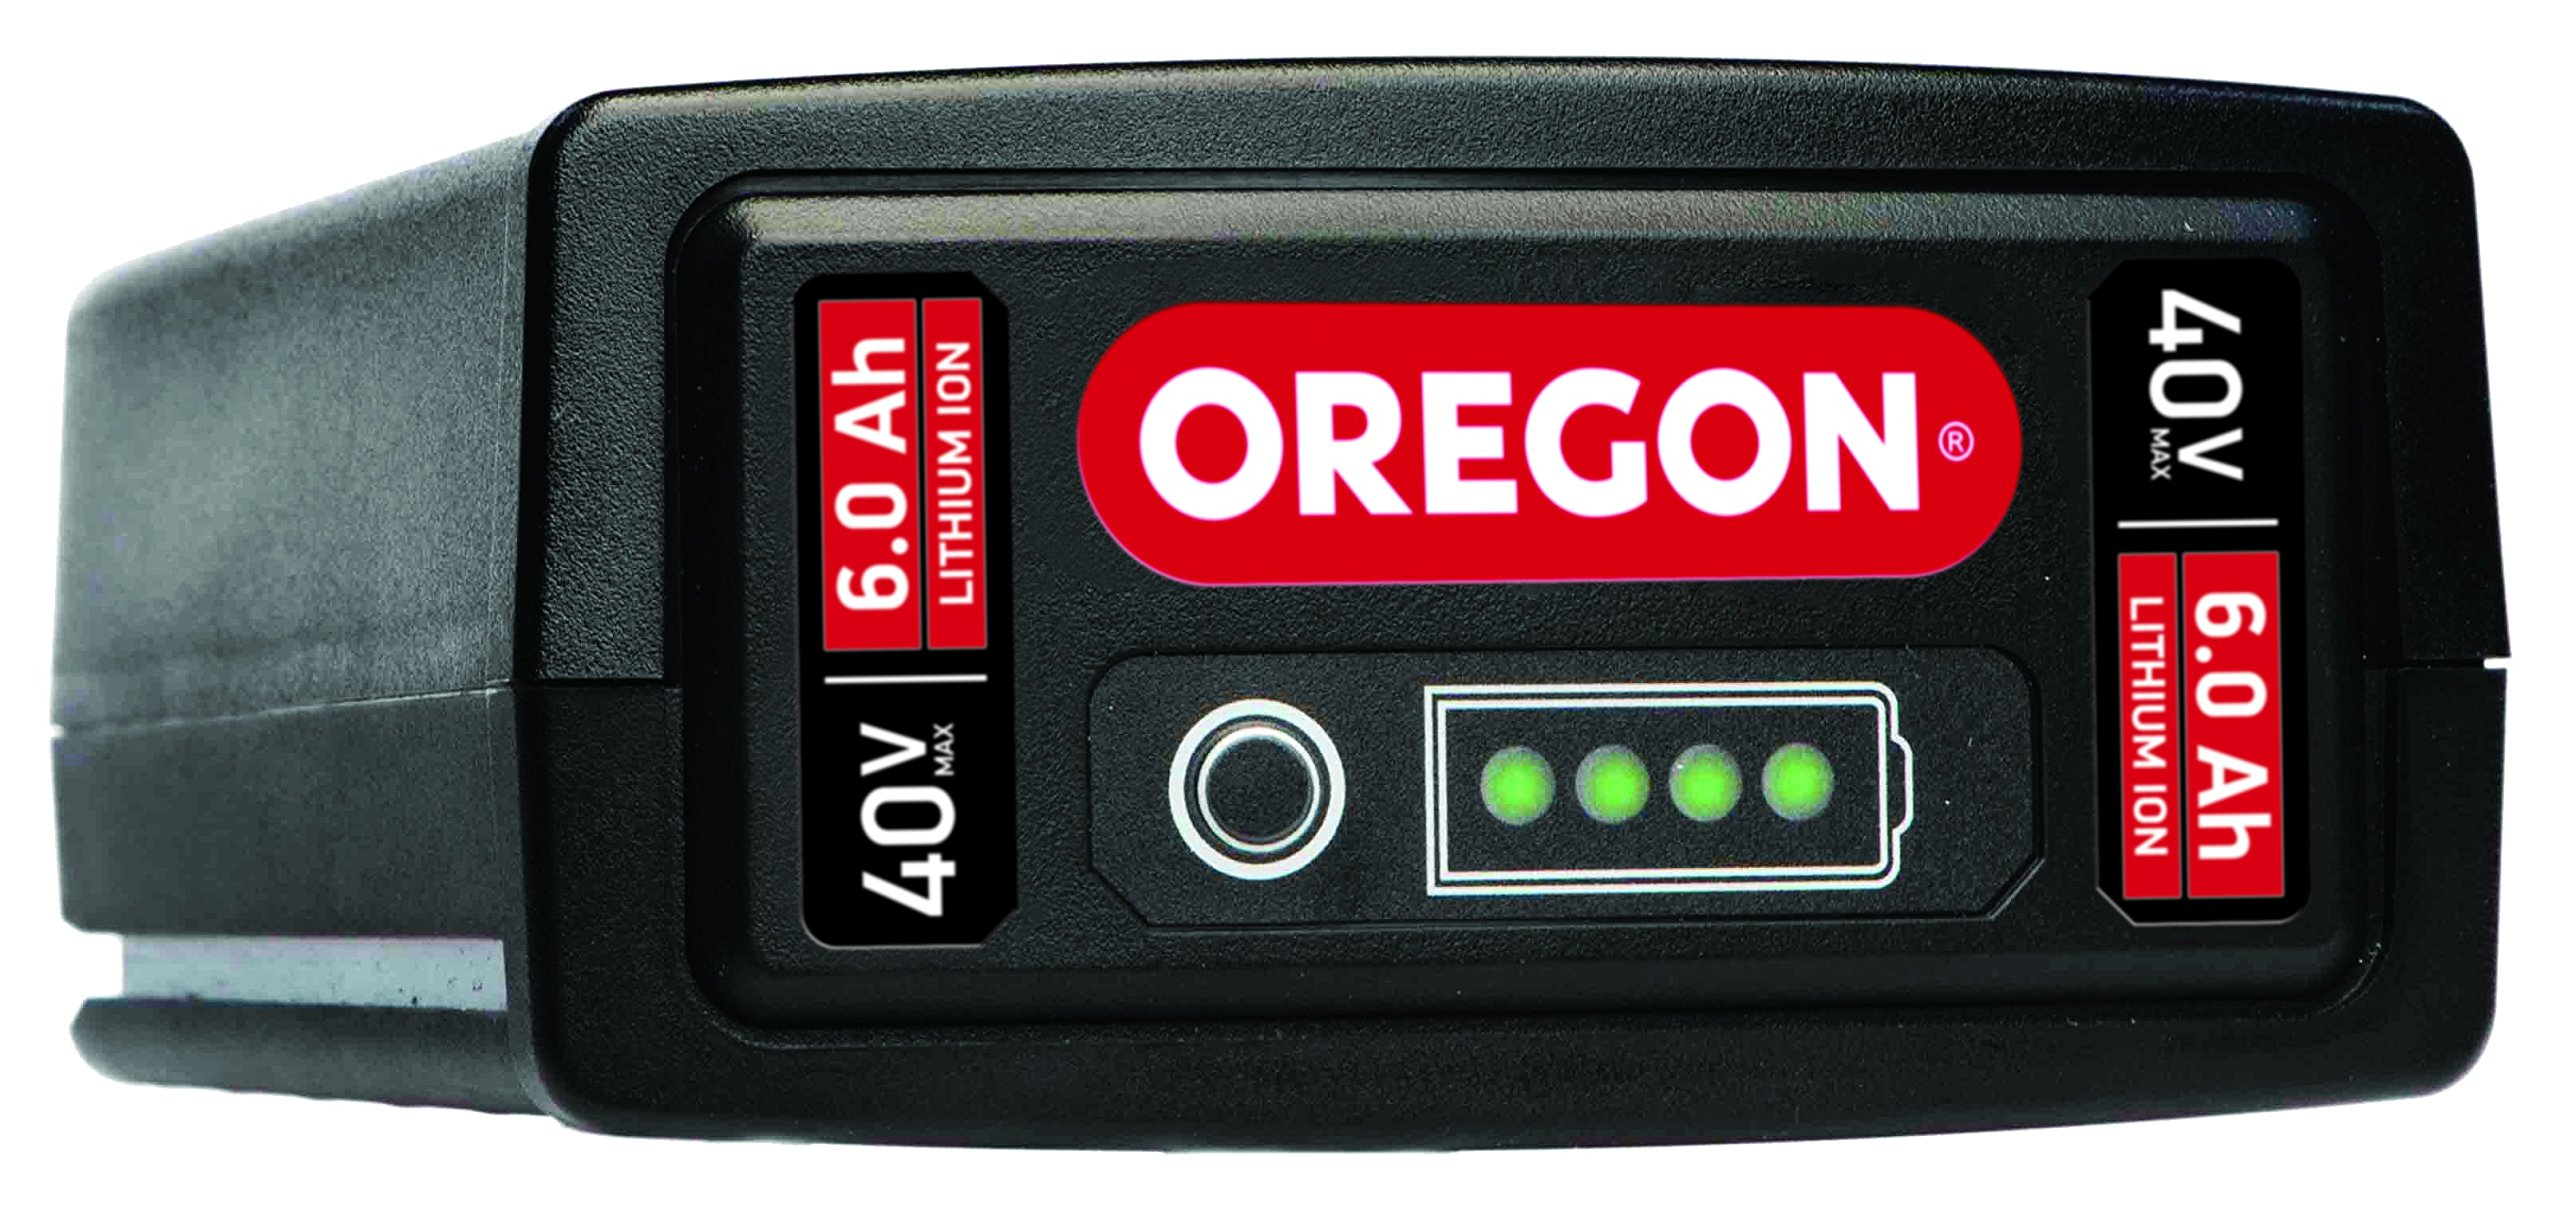 Oregon Cordless 40V Max B650E, 6.0 Ah Lithium-Ion Battery Pack by Oregon (Image #1)